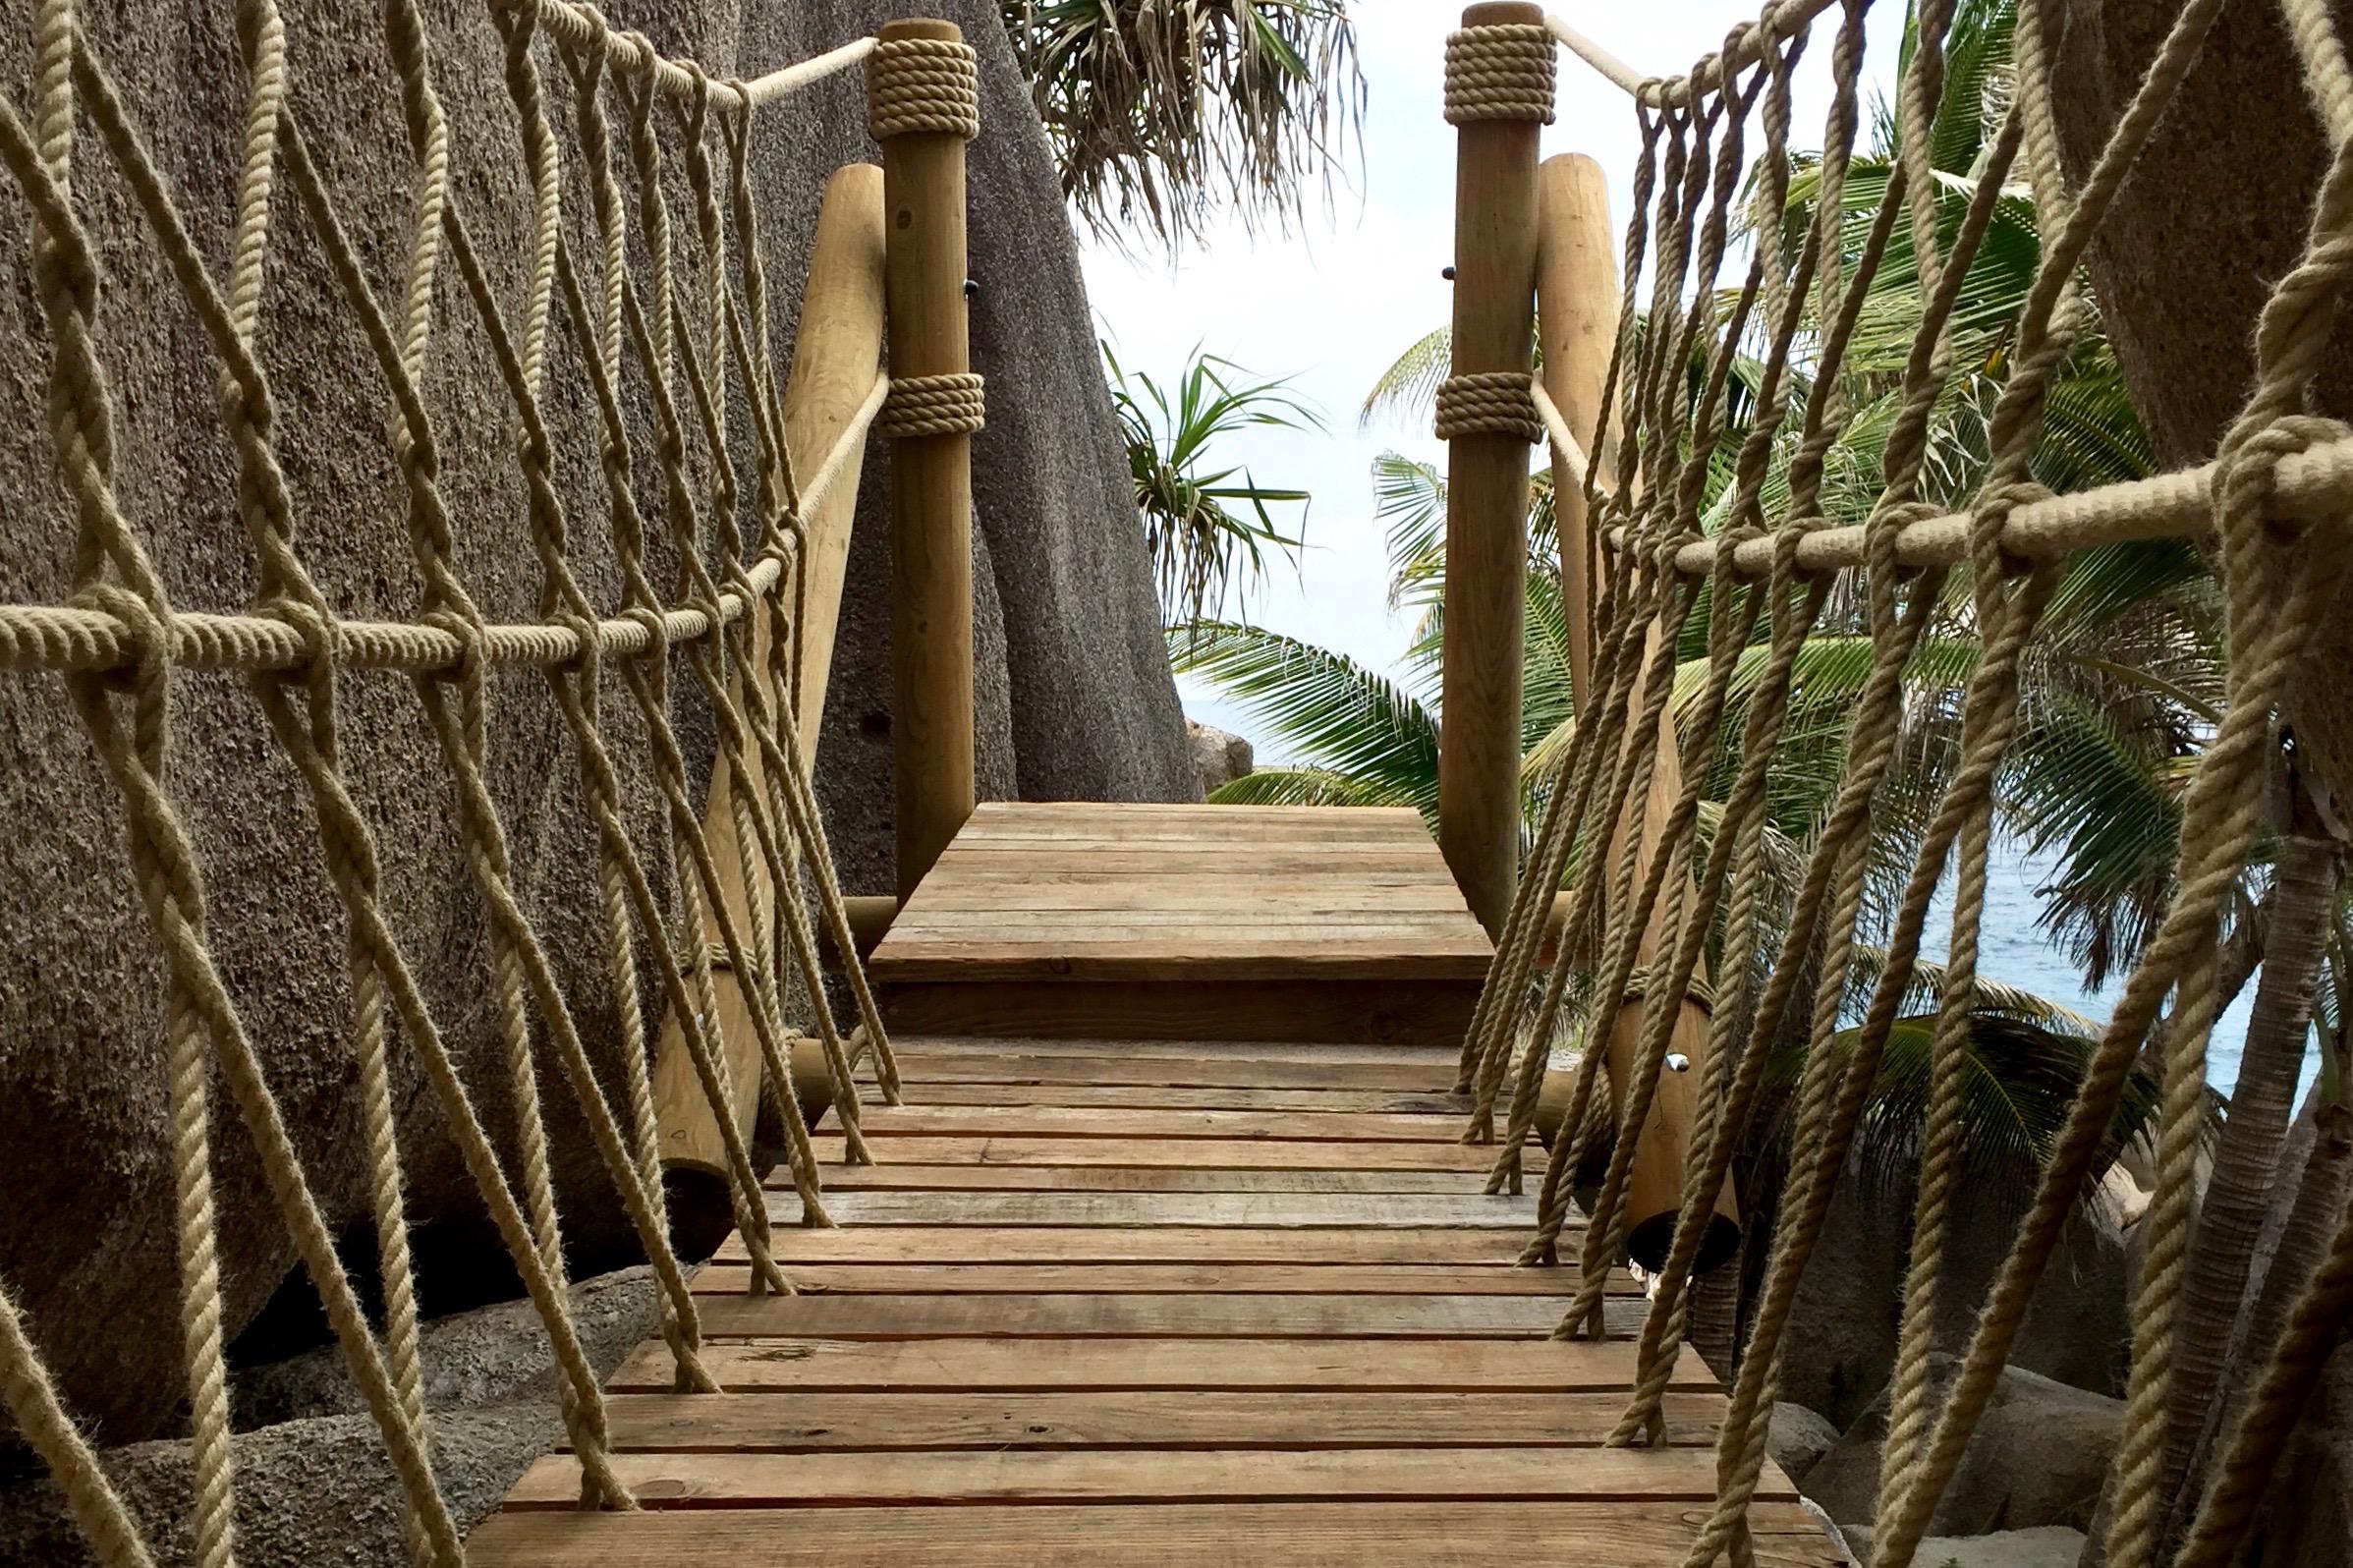 Rope Bridge deck and view